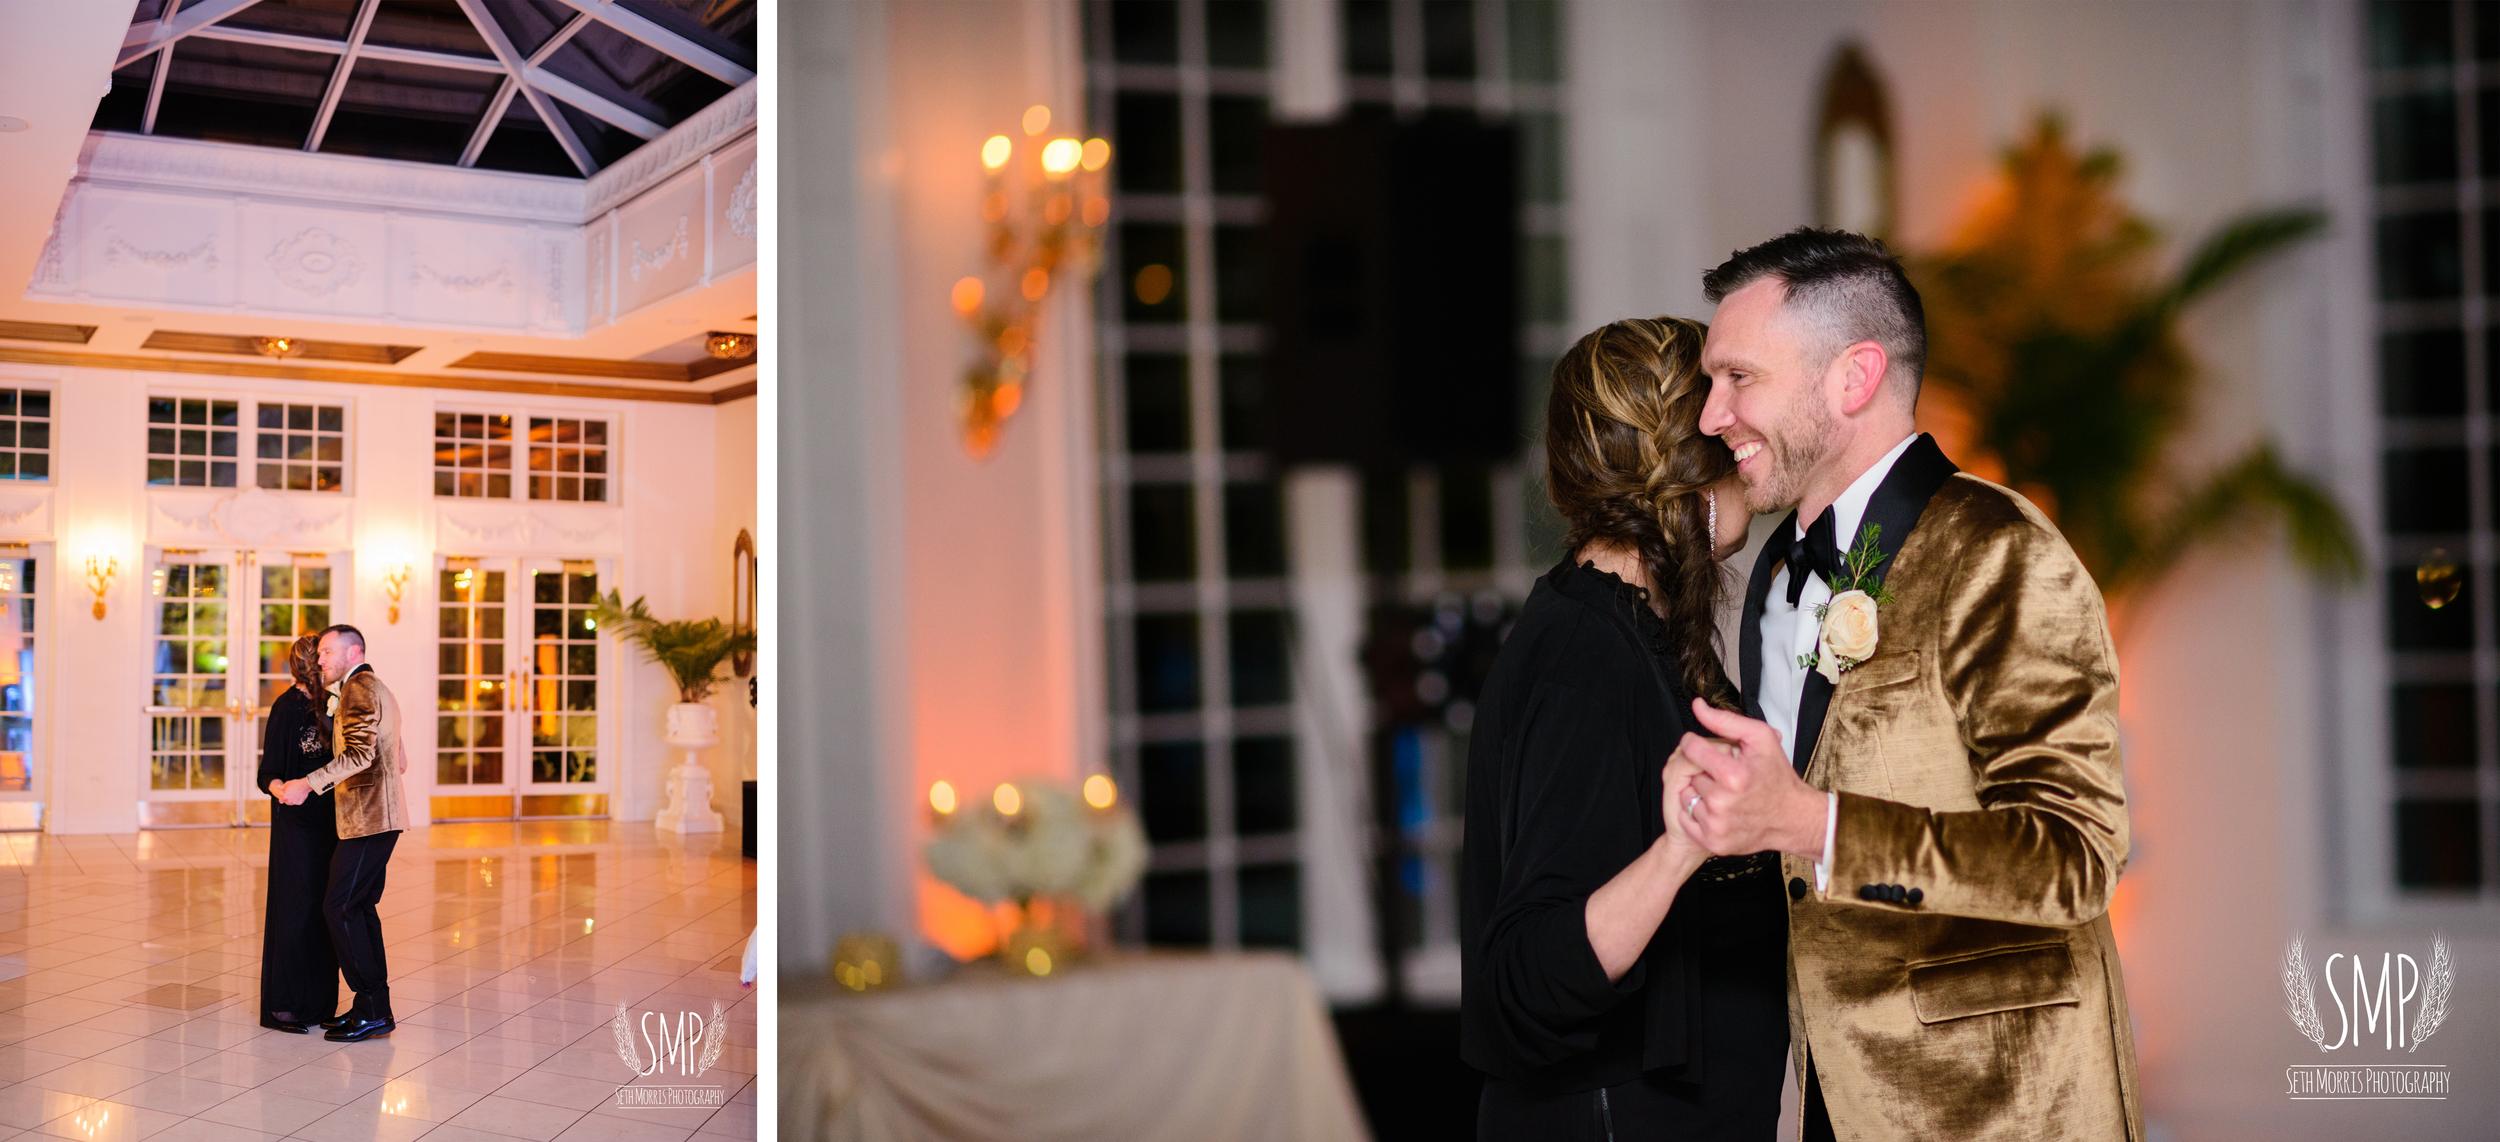 same-sex-wedding-photographer-chicago-illinois-104.jpg